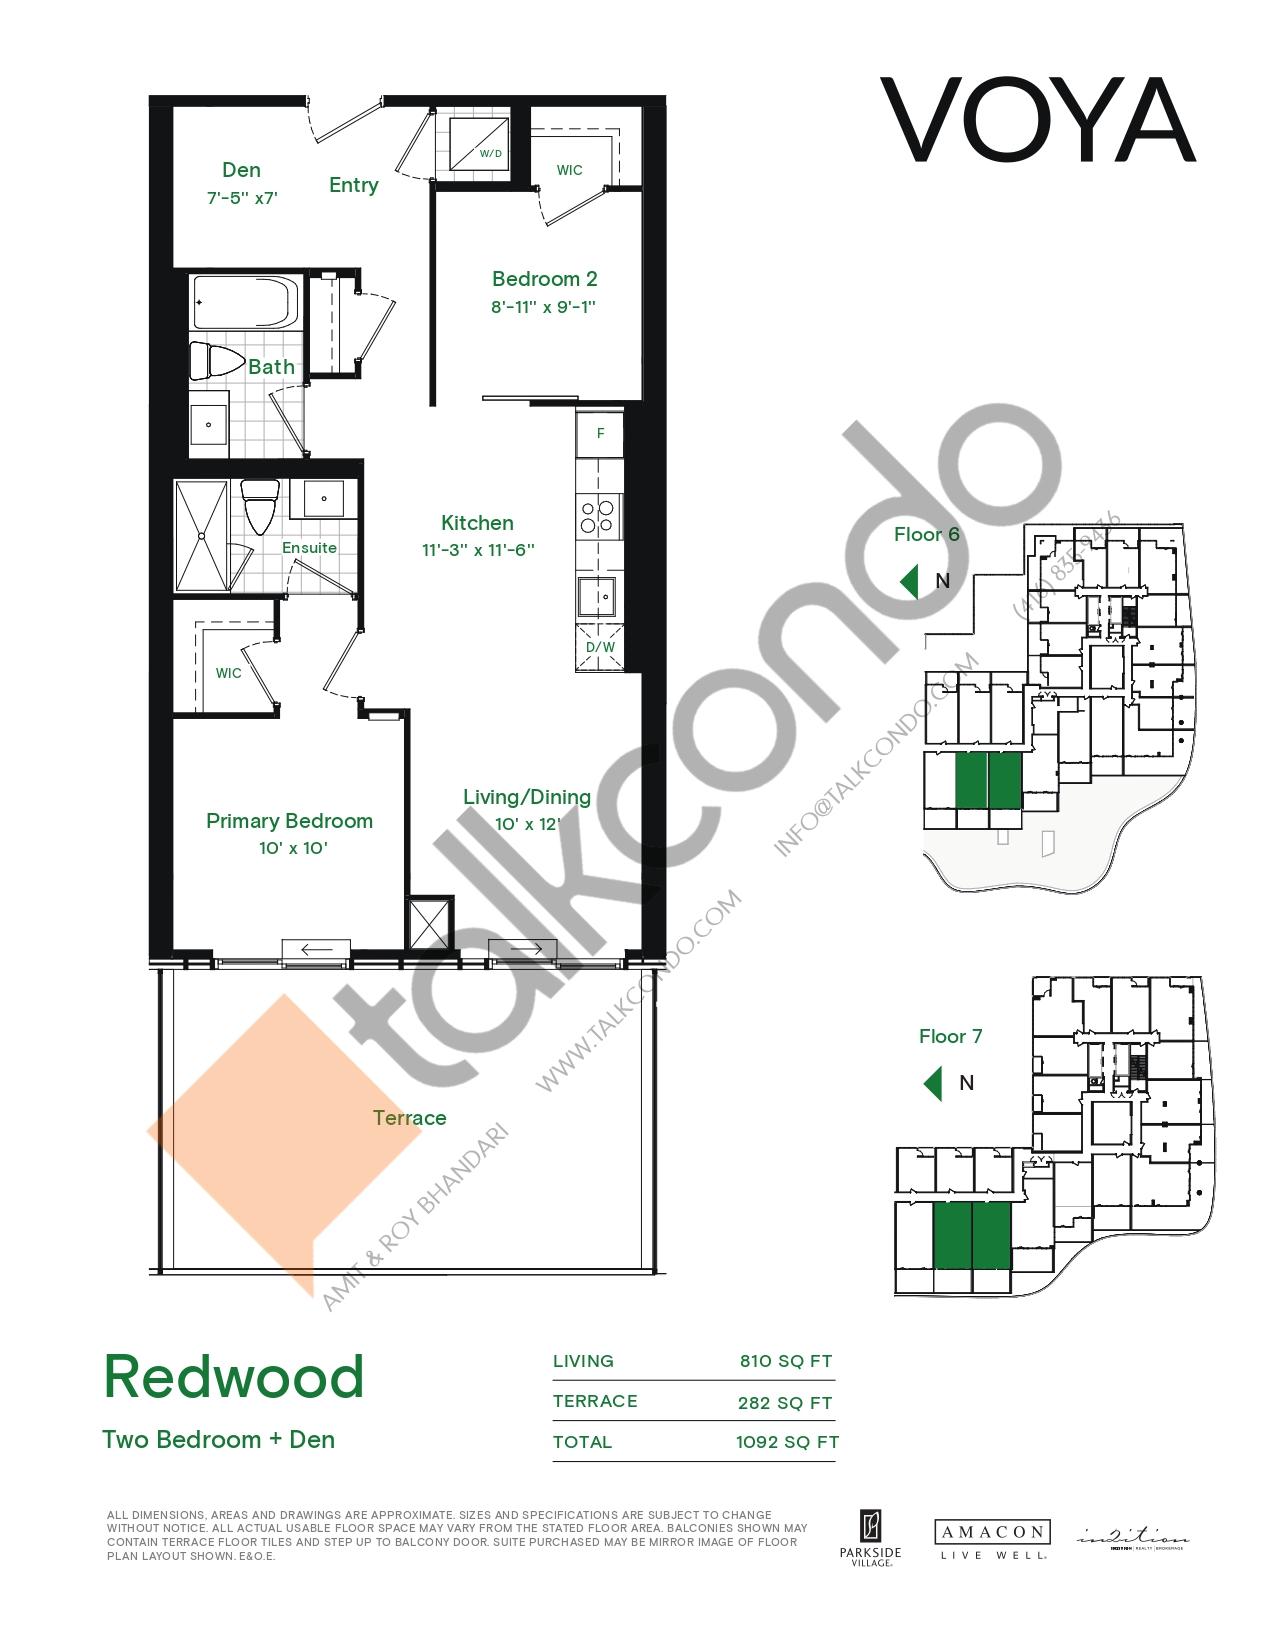 Redwood (Podium) Floor Plan at Voya at Parkside Village Condos - 810 sq.ft